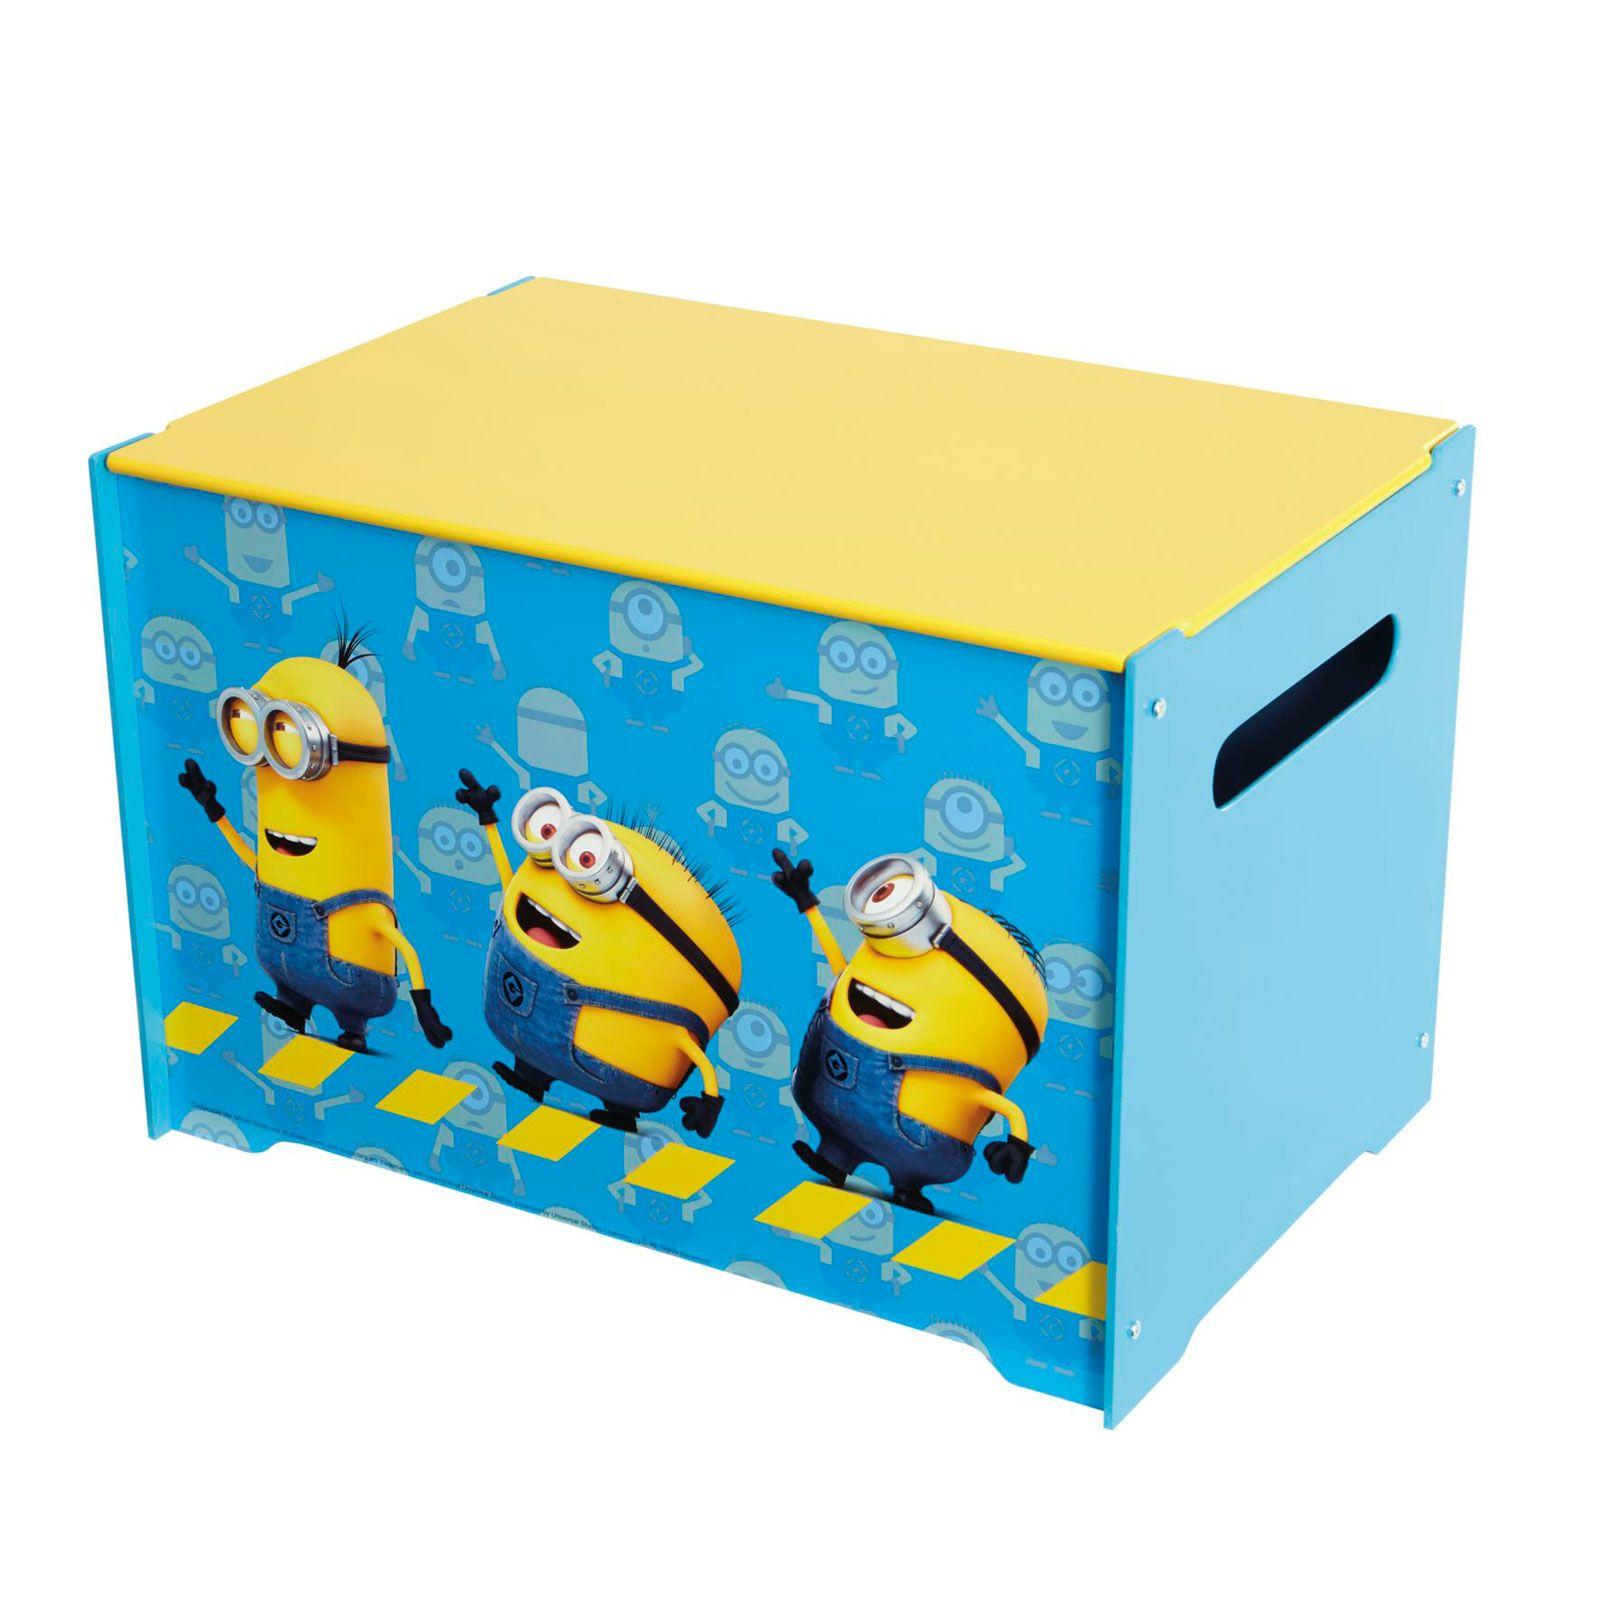 personnage disney boite jouet rangement de chambre cars minnie thomas peppa ebay. Black Bedroom Furniture Sets. Home Design Ideas